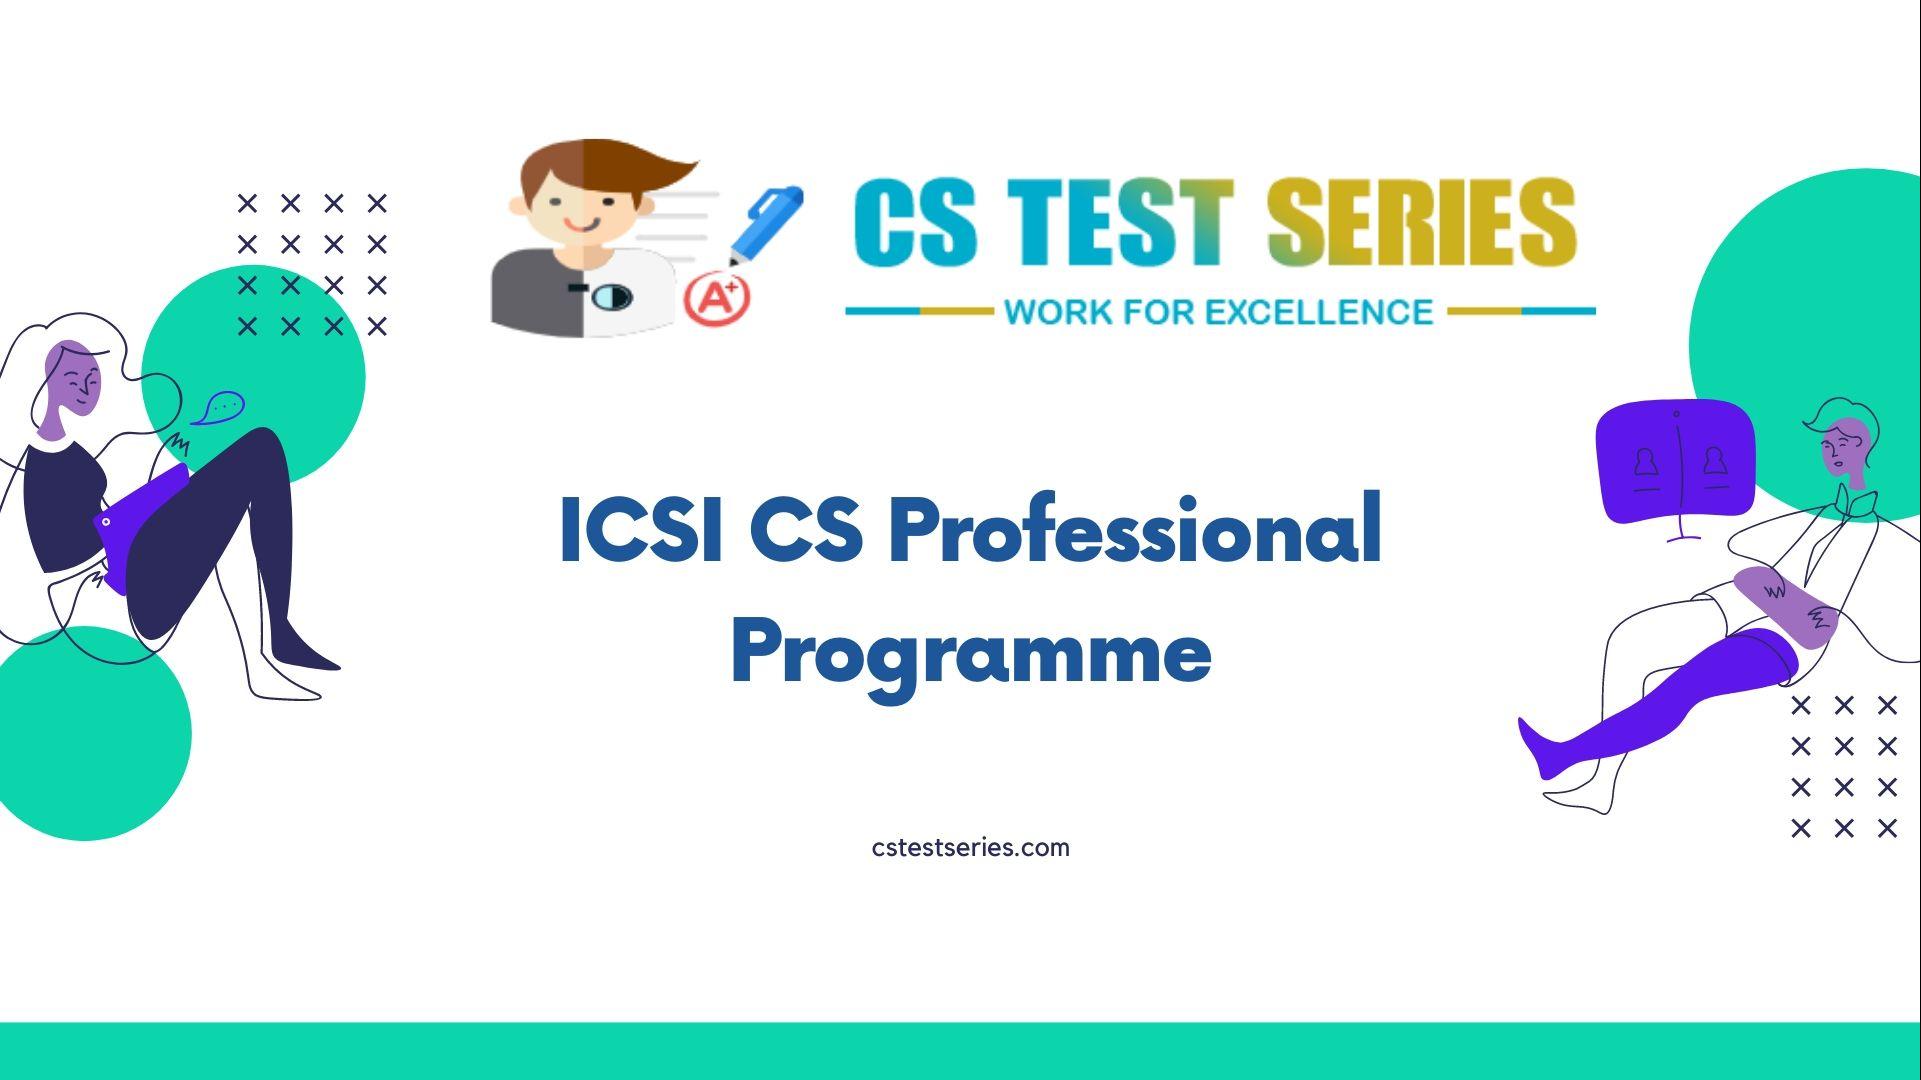 ICSI CS professional Programme - the Final stage to become a Company Secretary